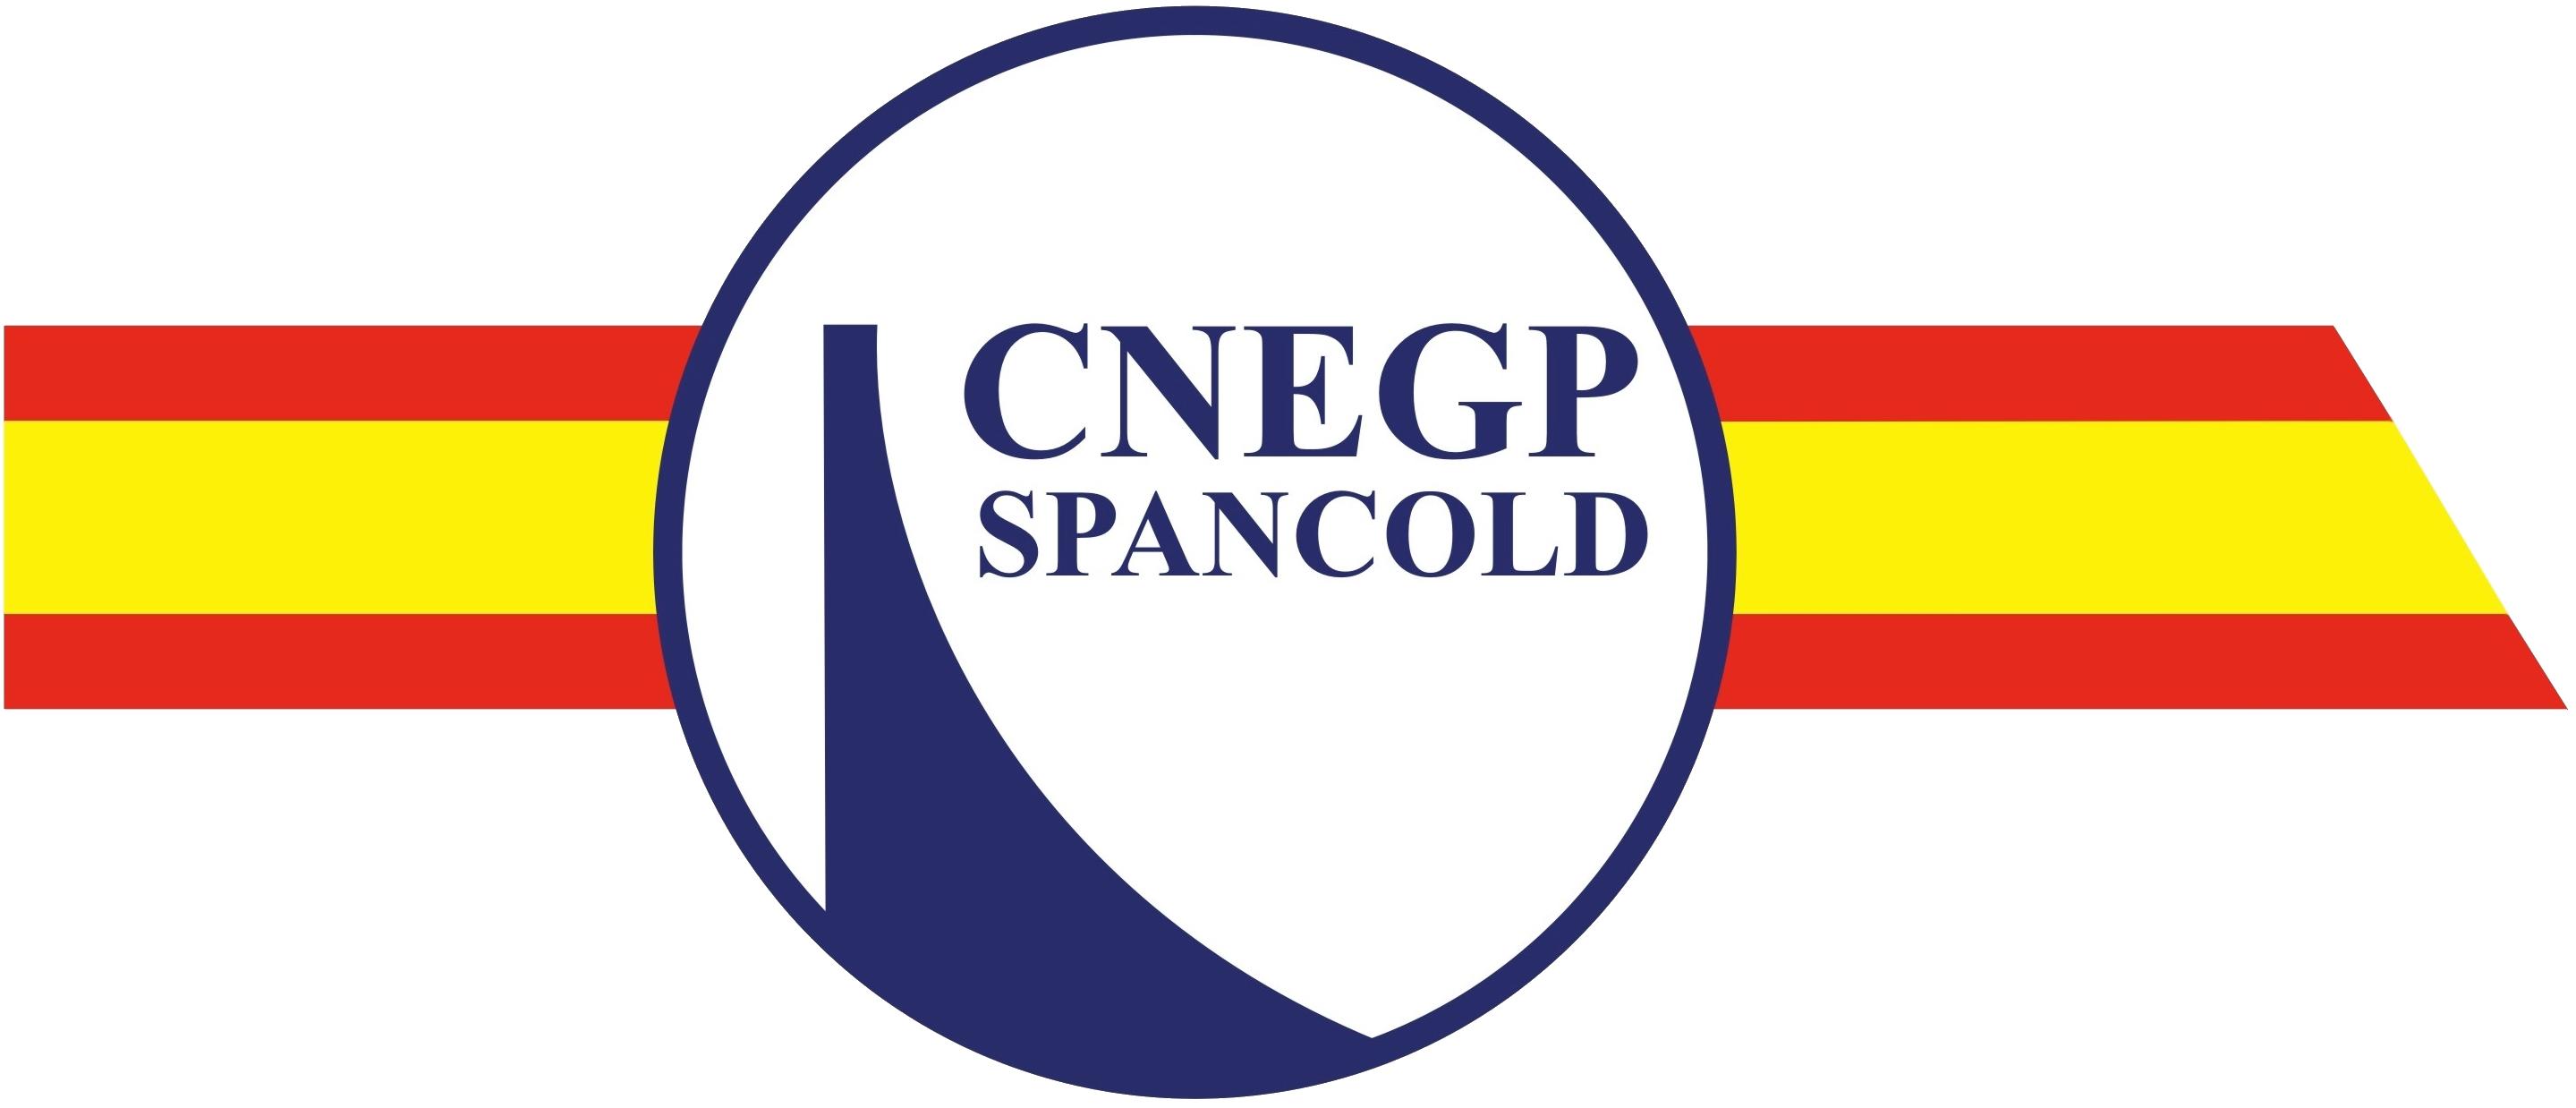 CNEGP SPANCOLD (Oficial)